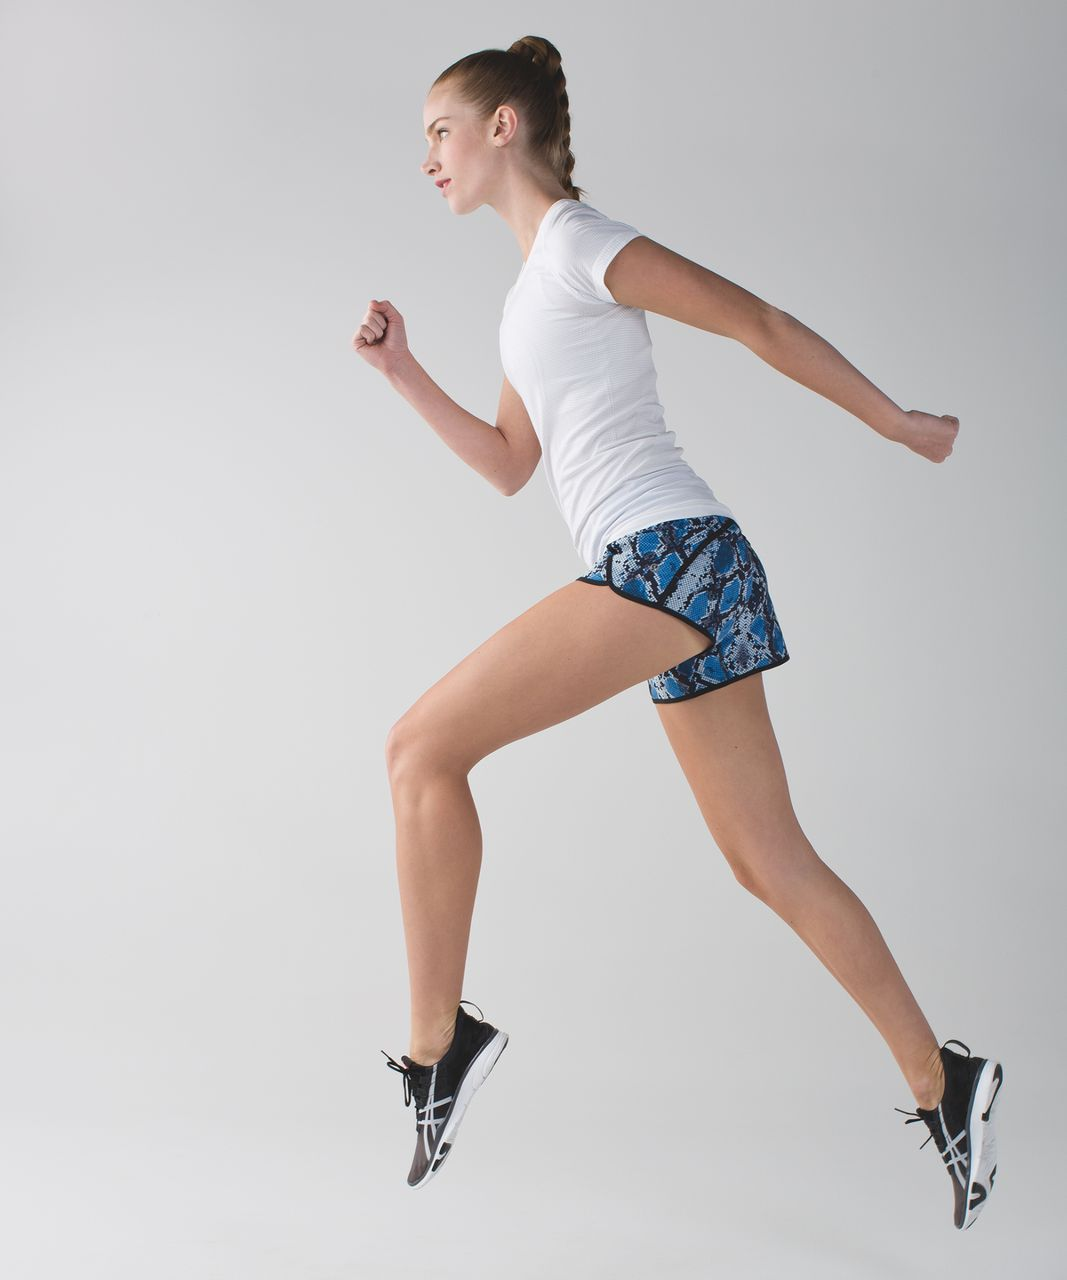 Lululemon Run Times Short *4-way Stretch - Mini Ziggy Snake Caspian Blue Pipe Dream Blue / Pipe Dream Blue